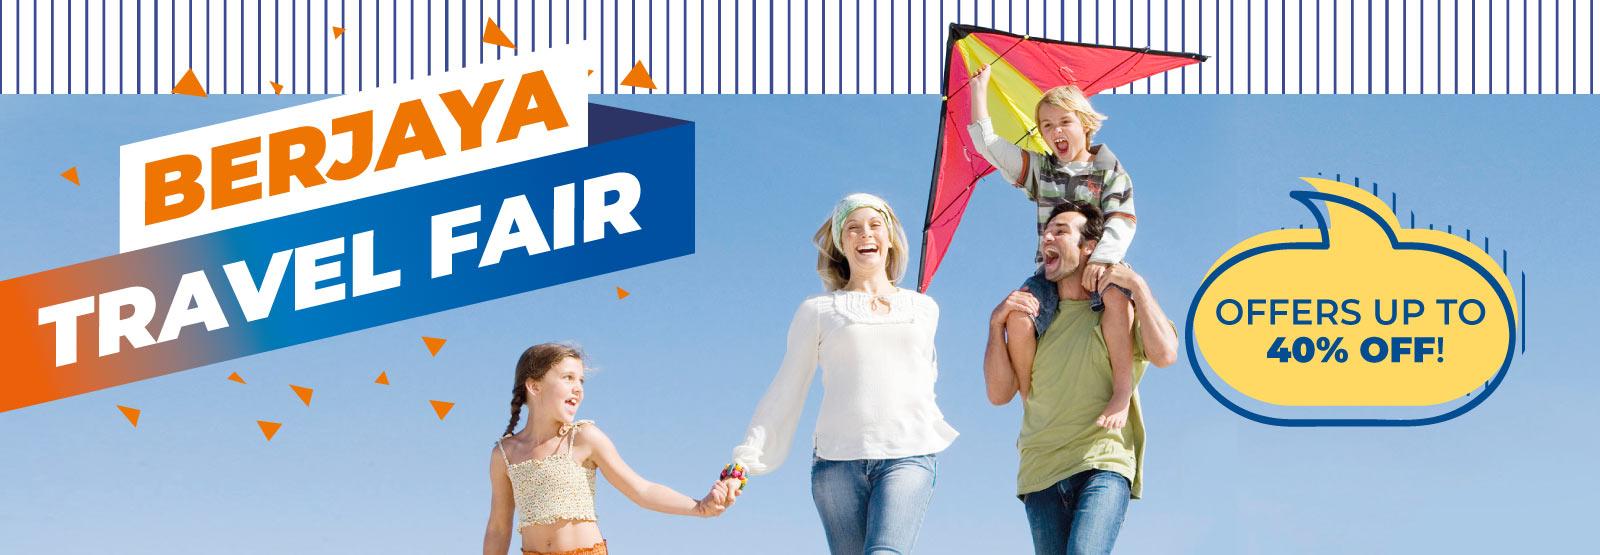 Berjaya Travel Fair Up to 40% off